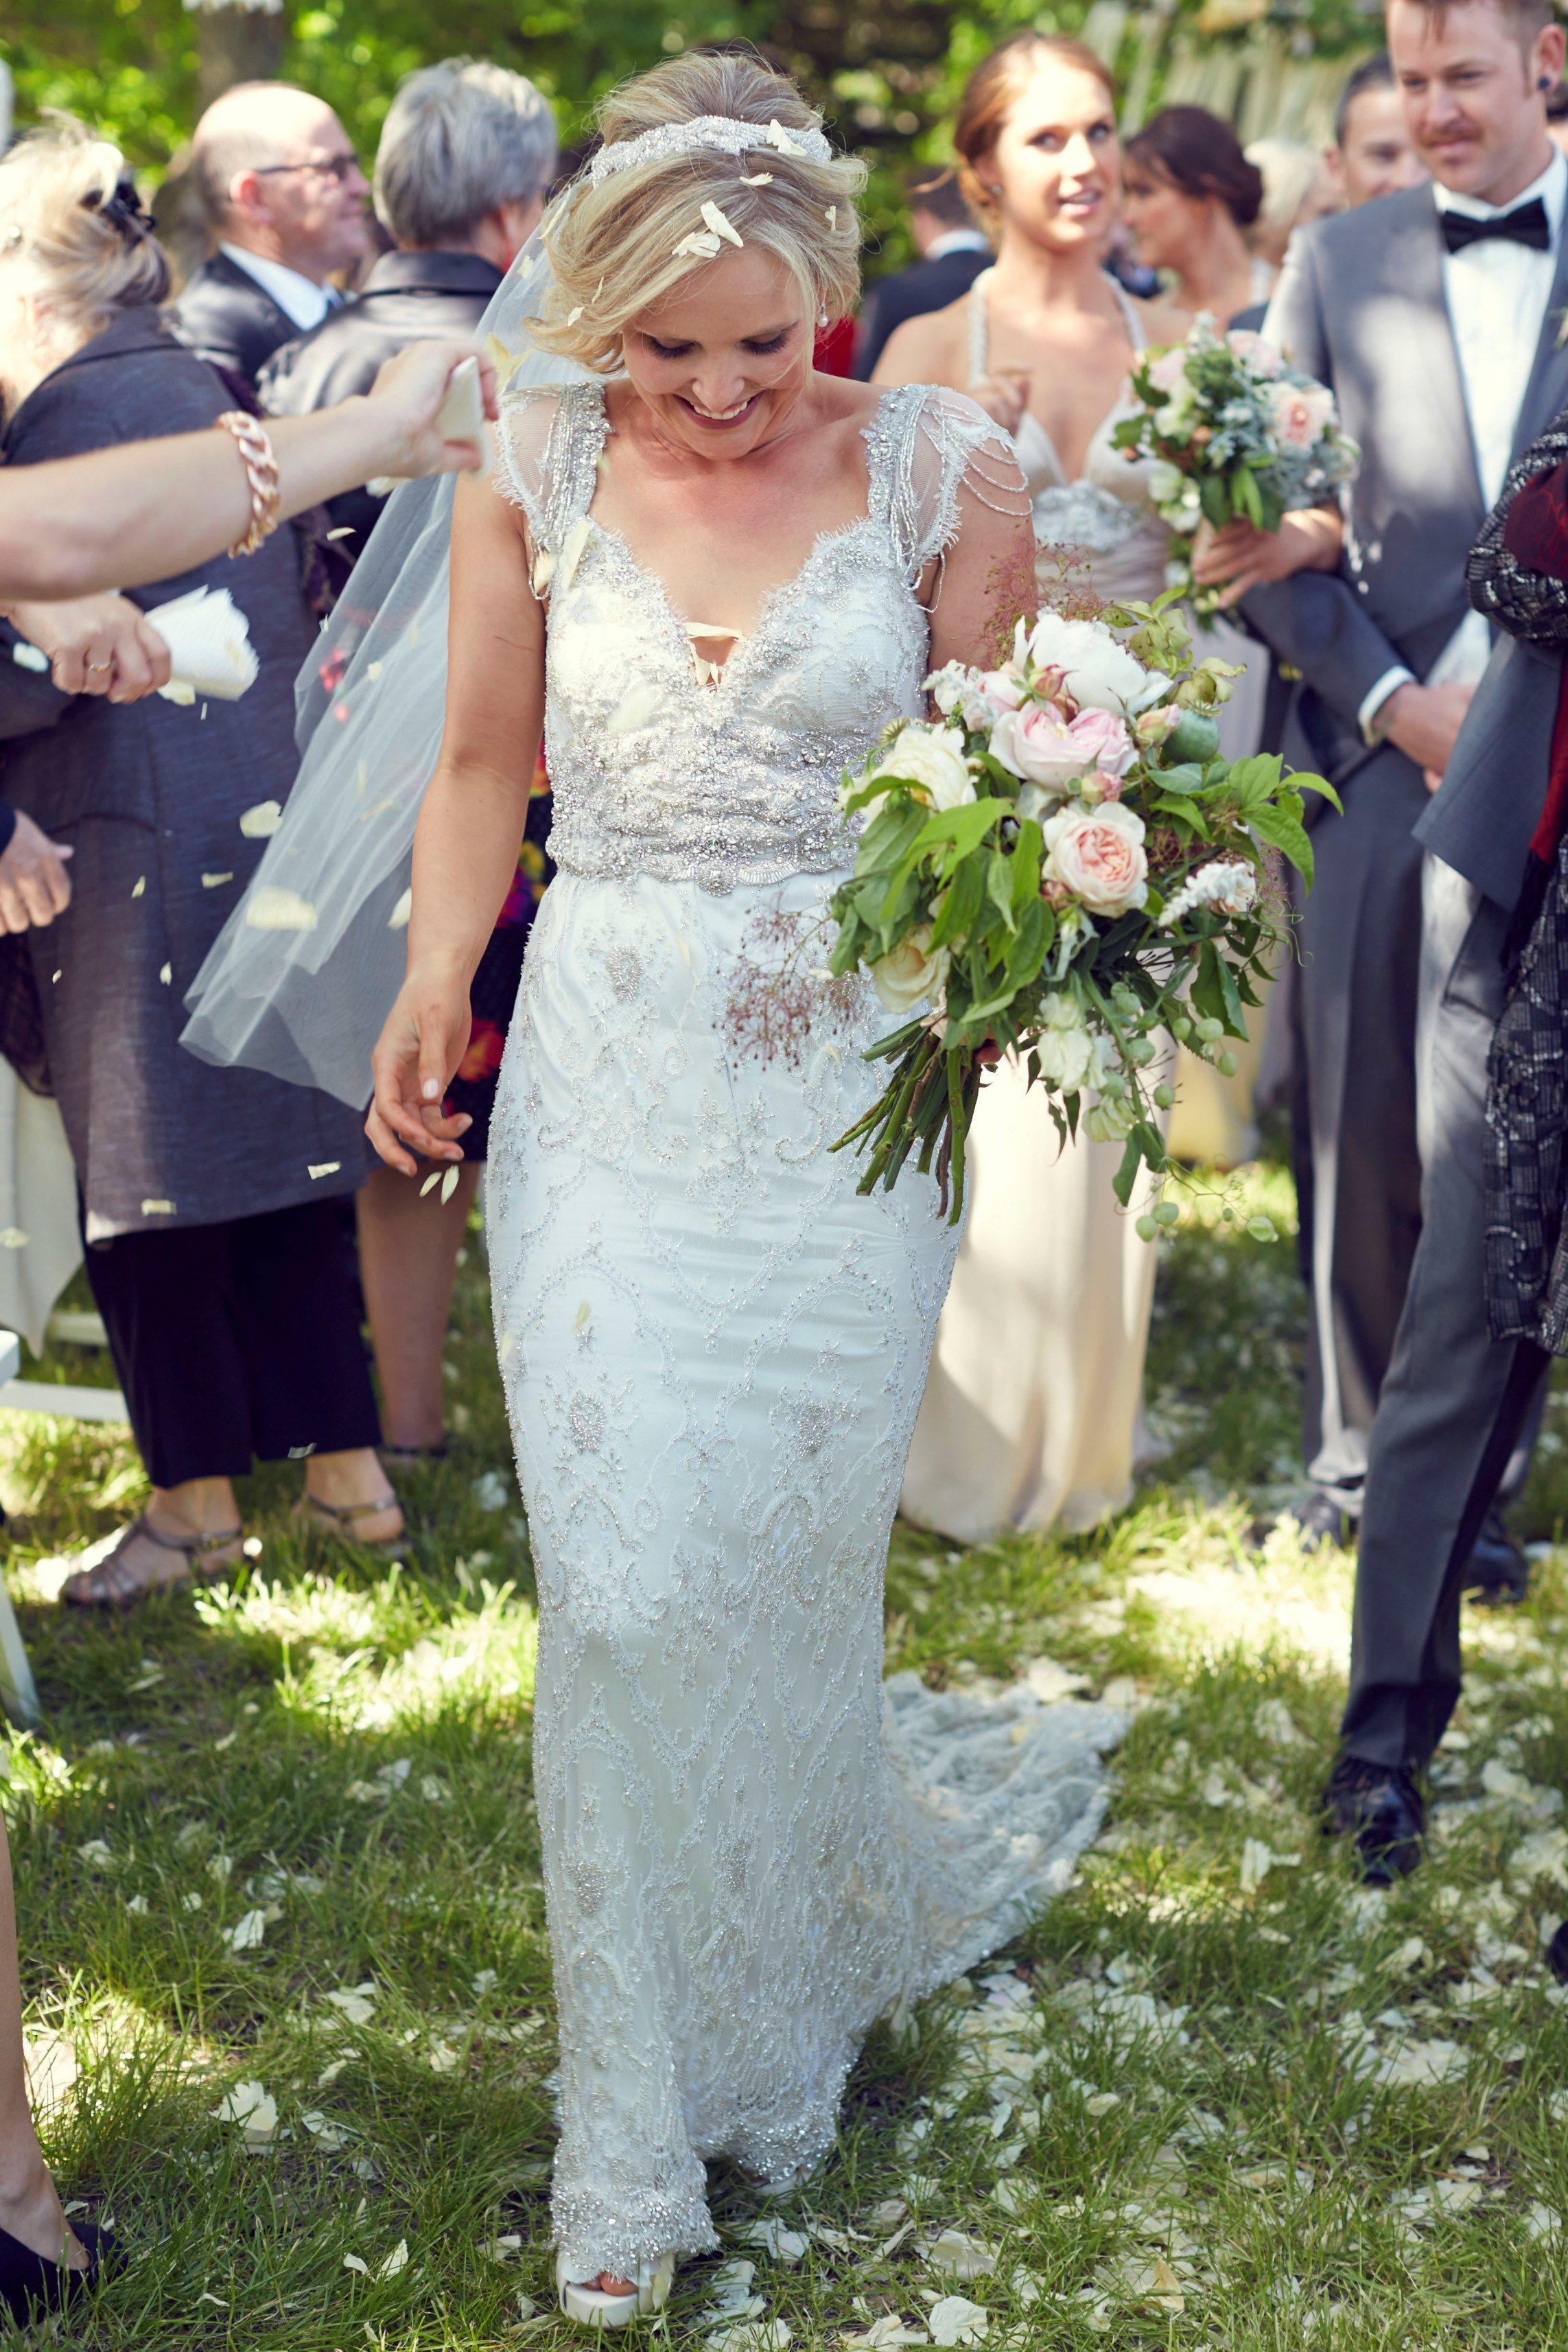 Mature bride wedding dresses  Romantic and Rustic Victoria Wedding at Andersonus Mill  Milling